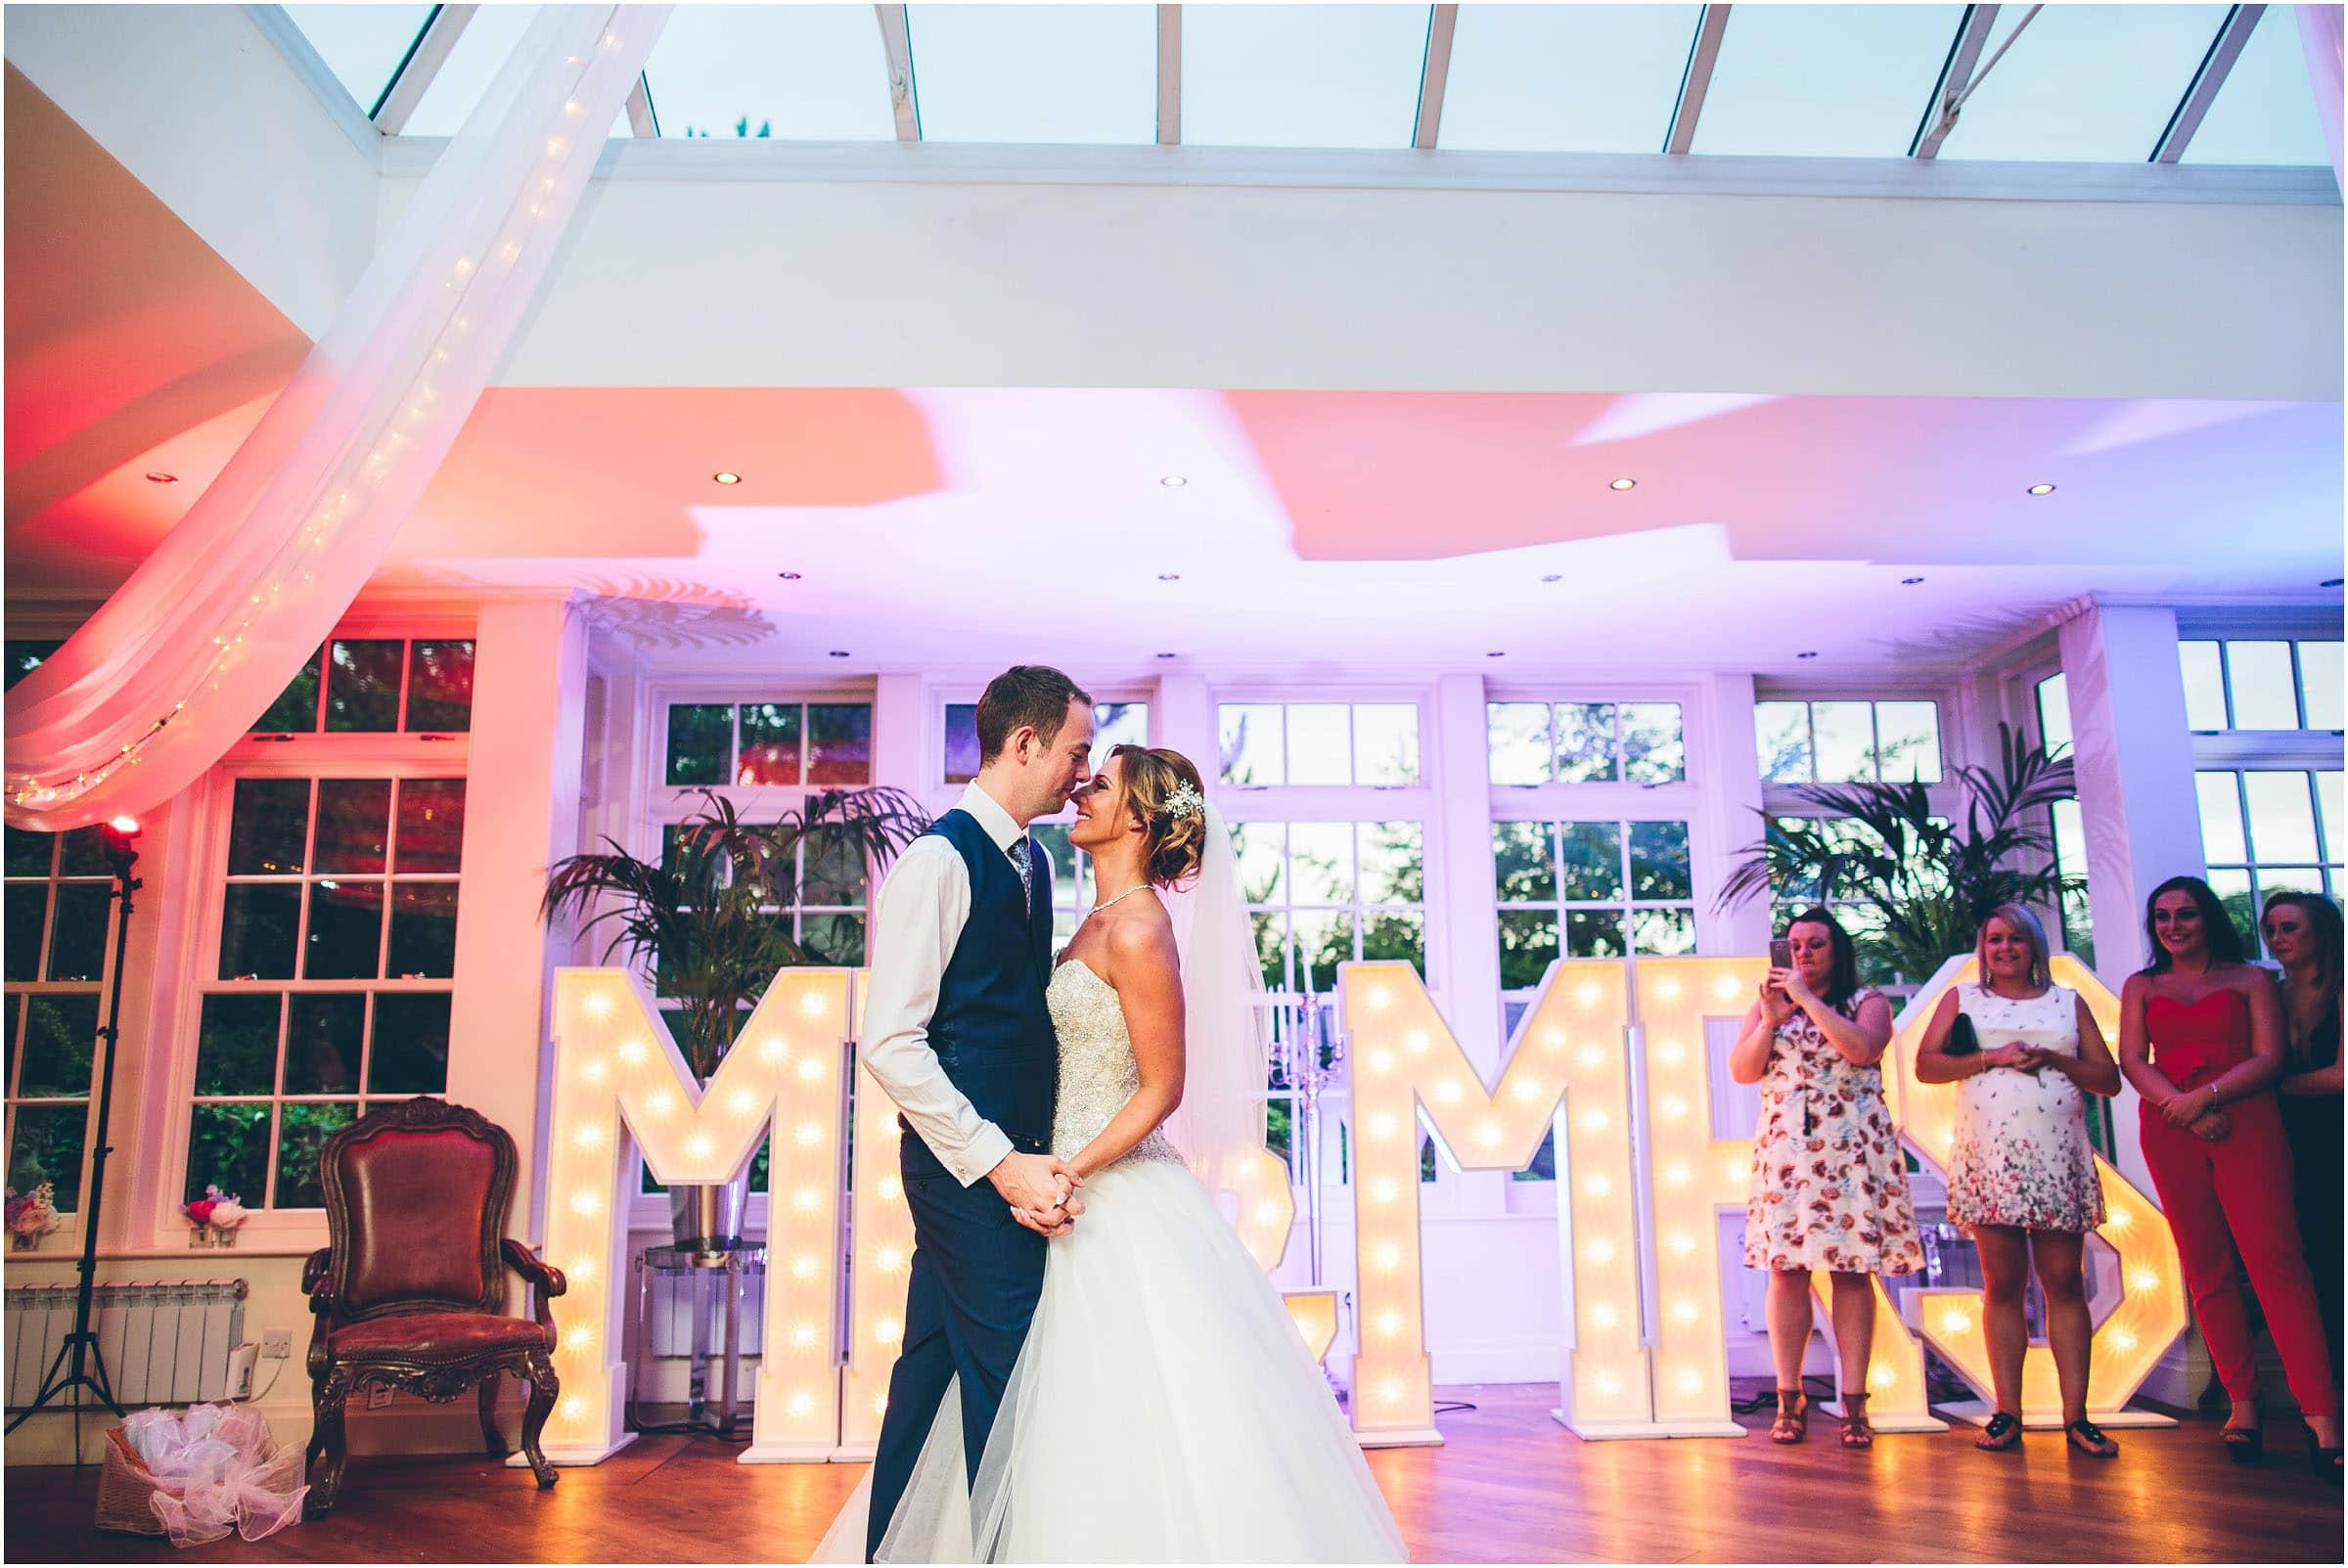 Mitton_Hall_Wedding_Photography_0118